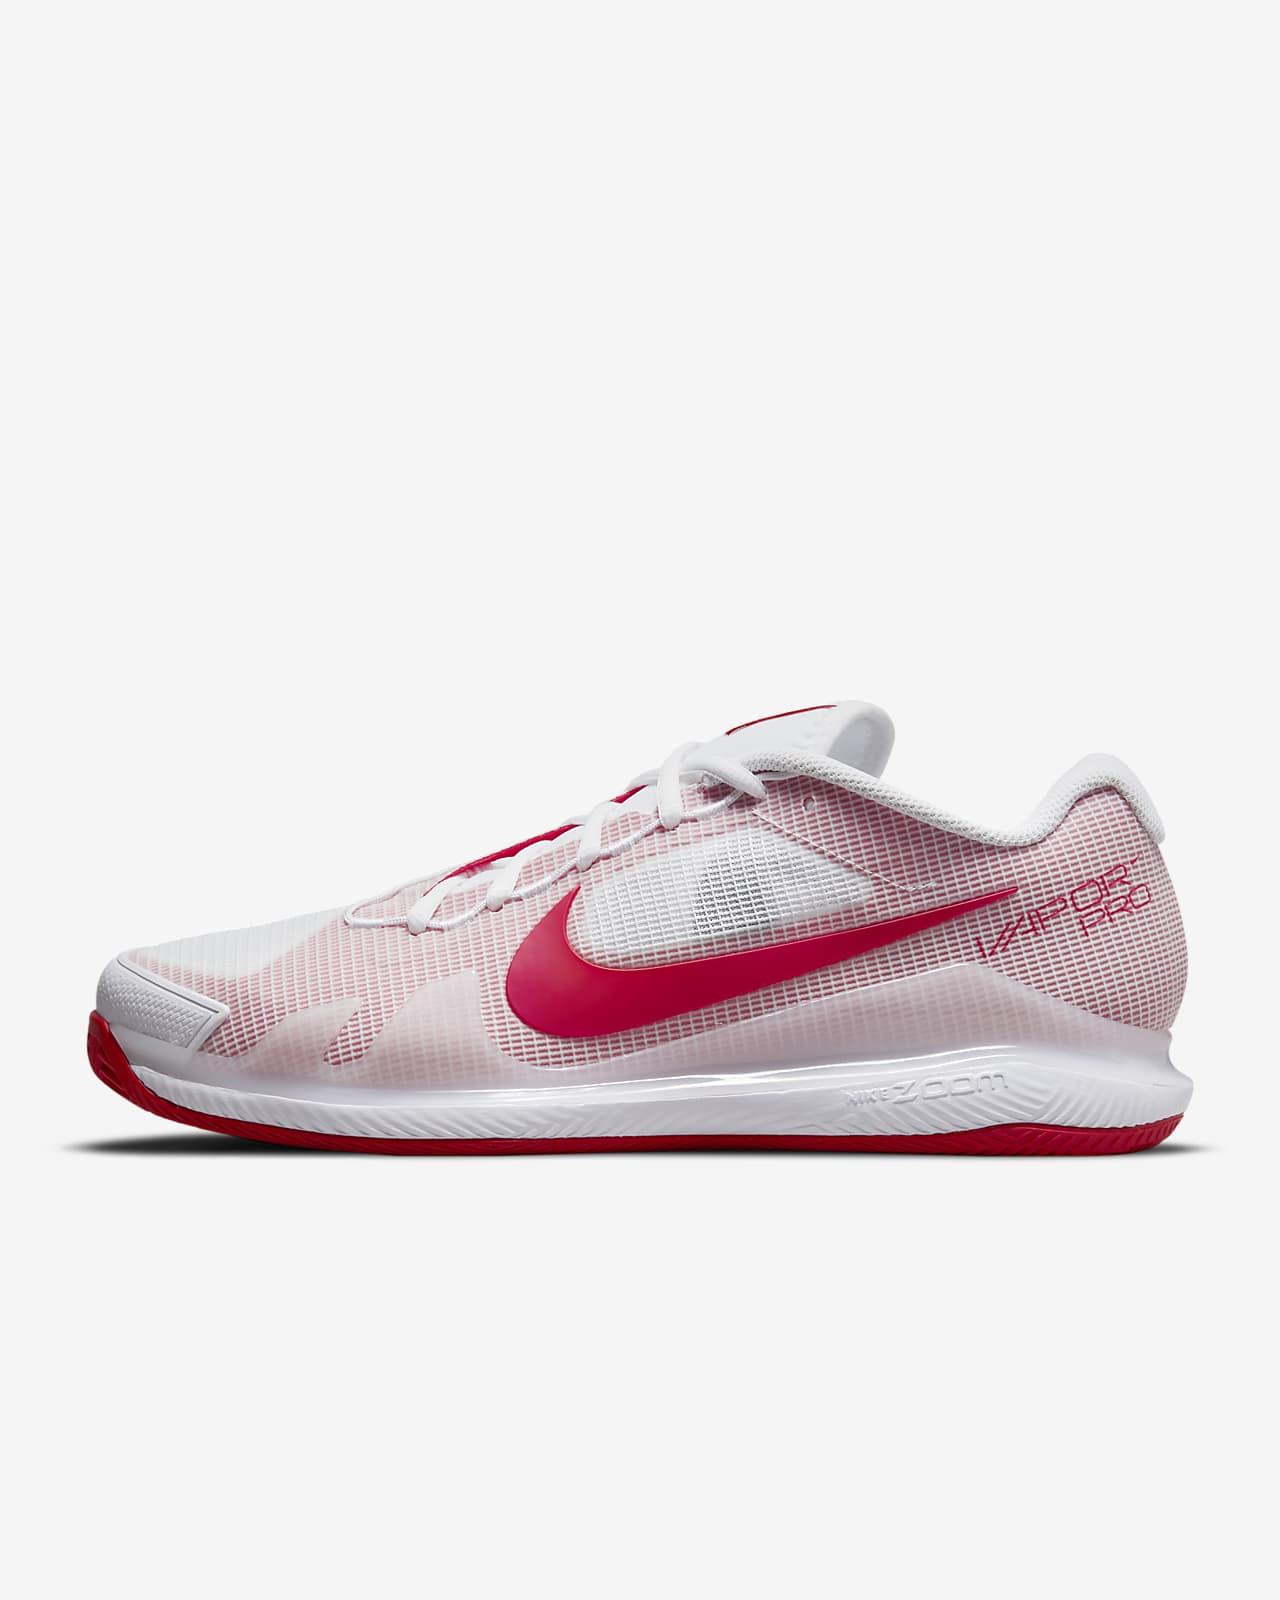 Calzado de tenis de cancha de arcilla para hombre NikeCourt Air Zoom Vapor Pro